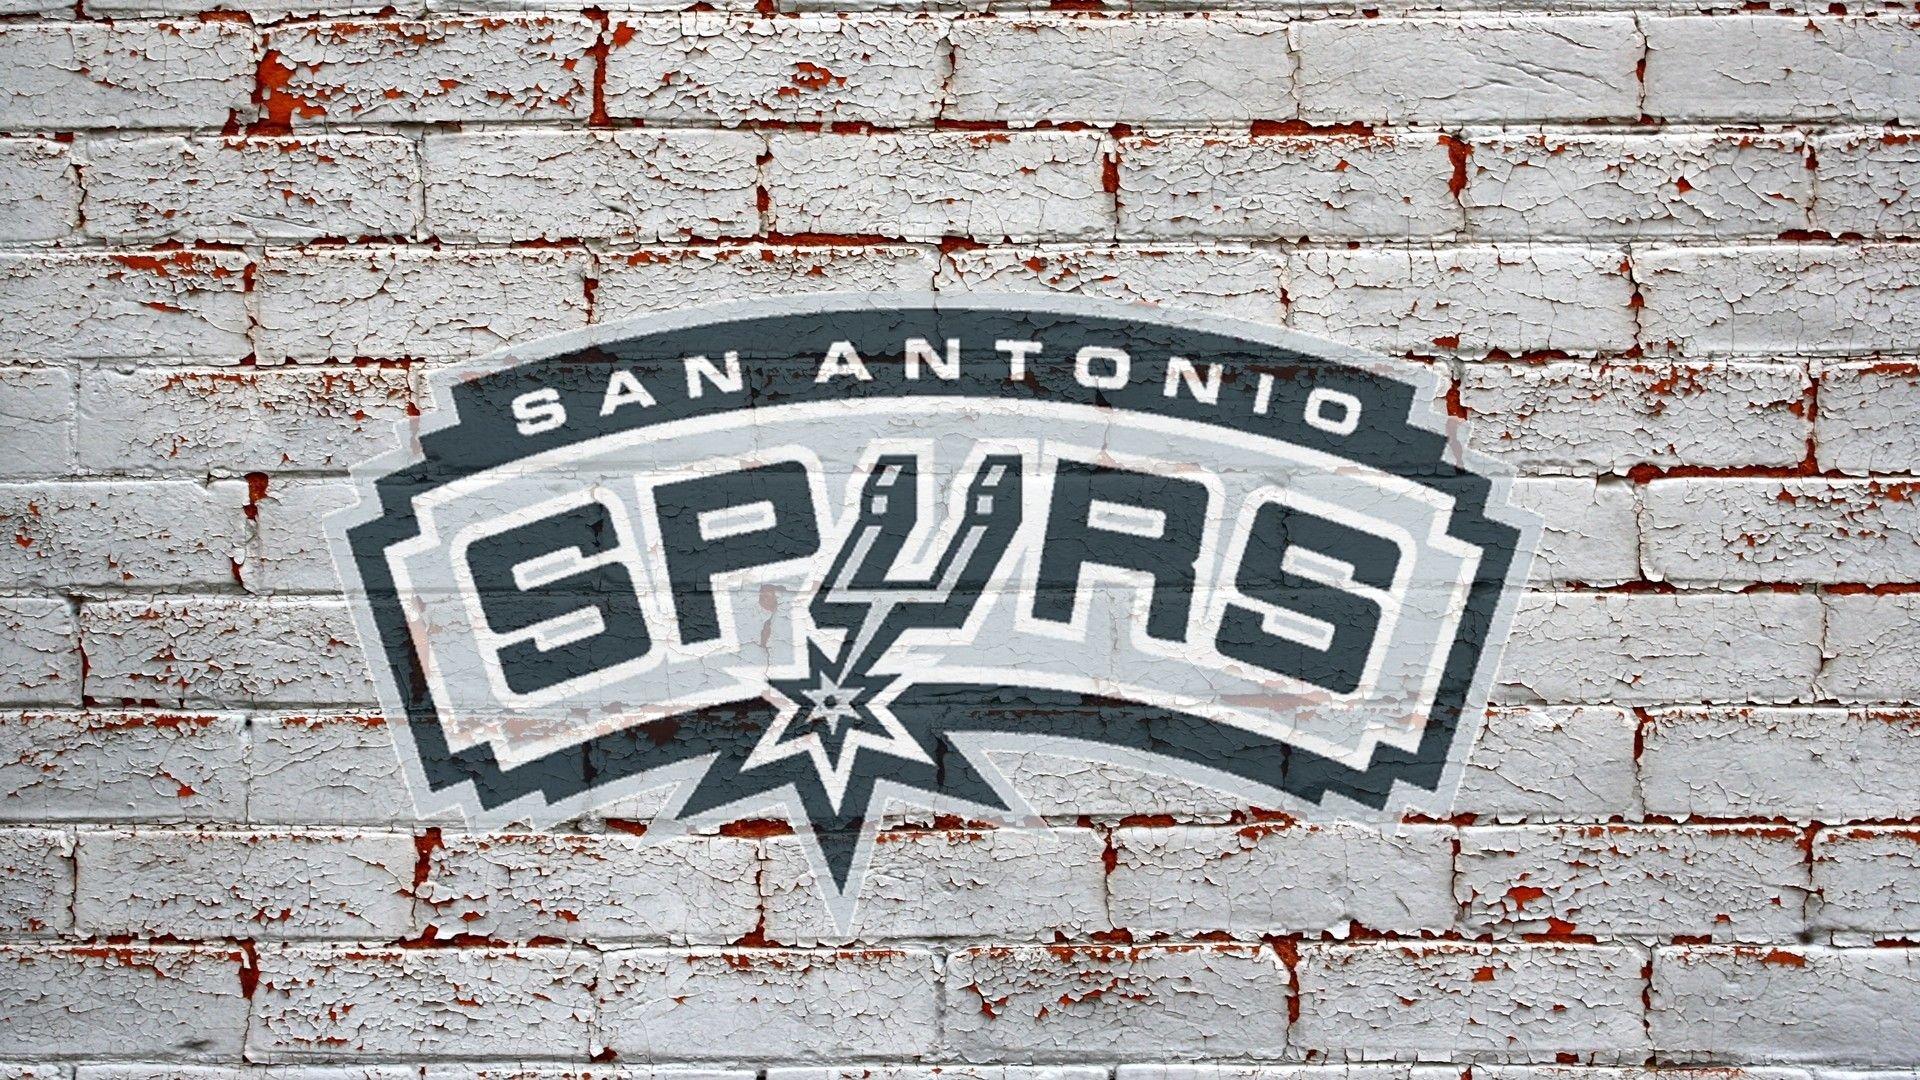 San Antonio Spurs wallpaper picture hd